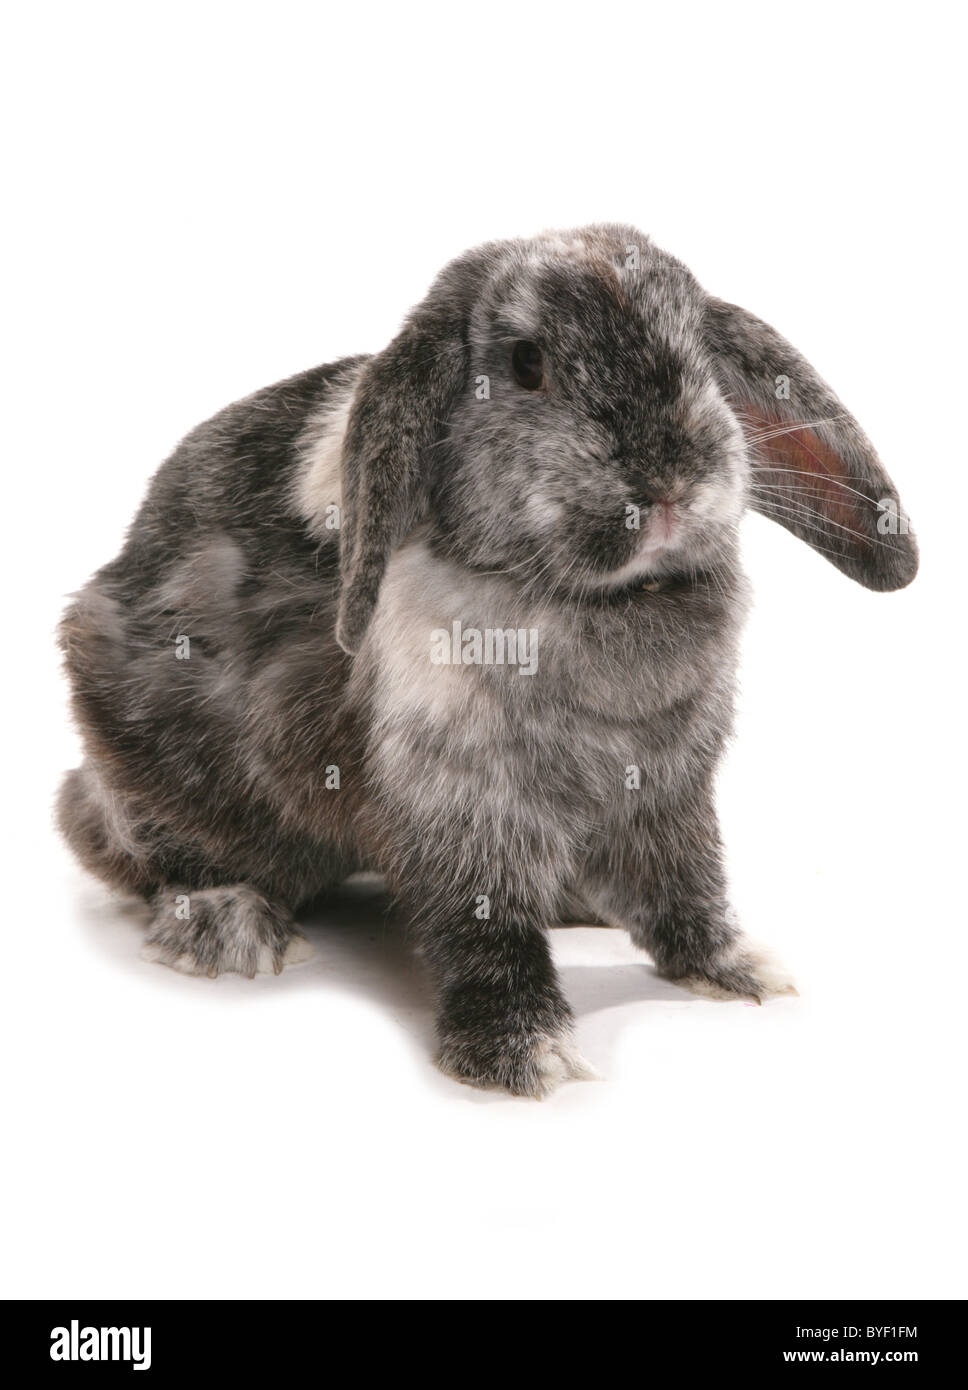 lop eared rabbit studio - Stock Image